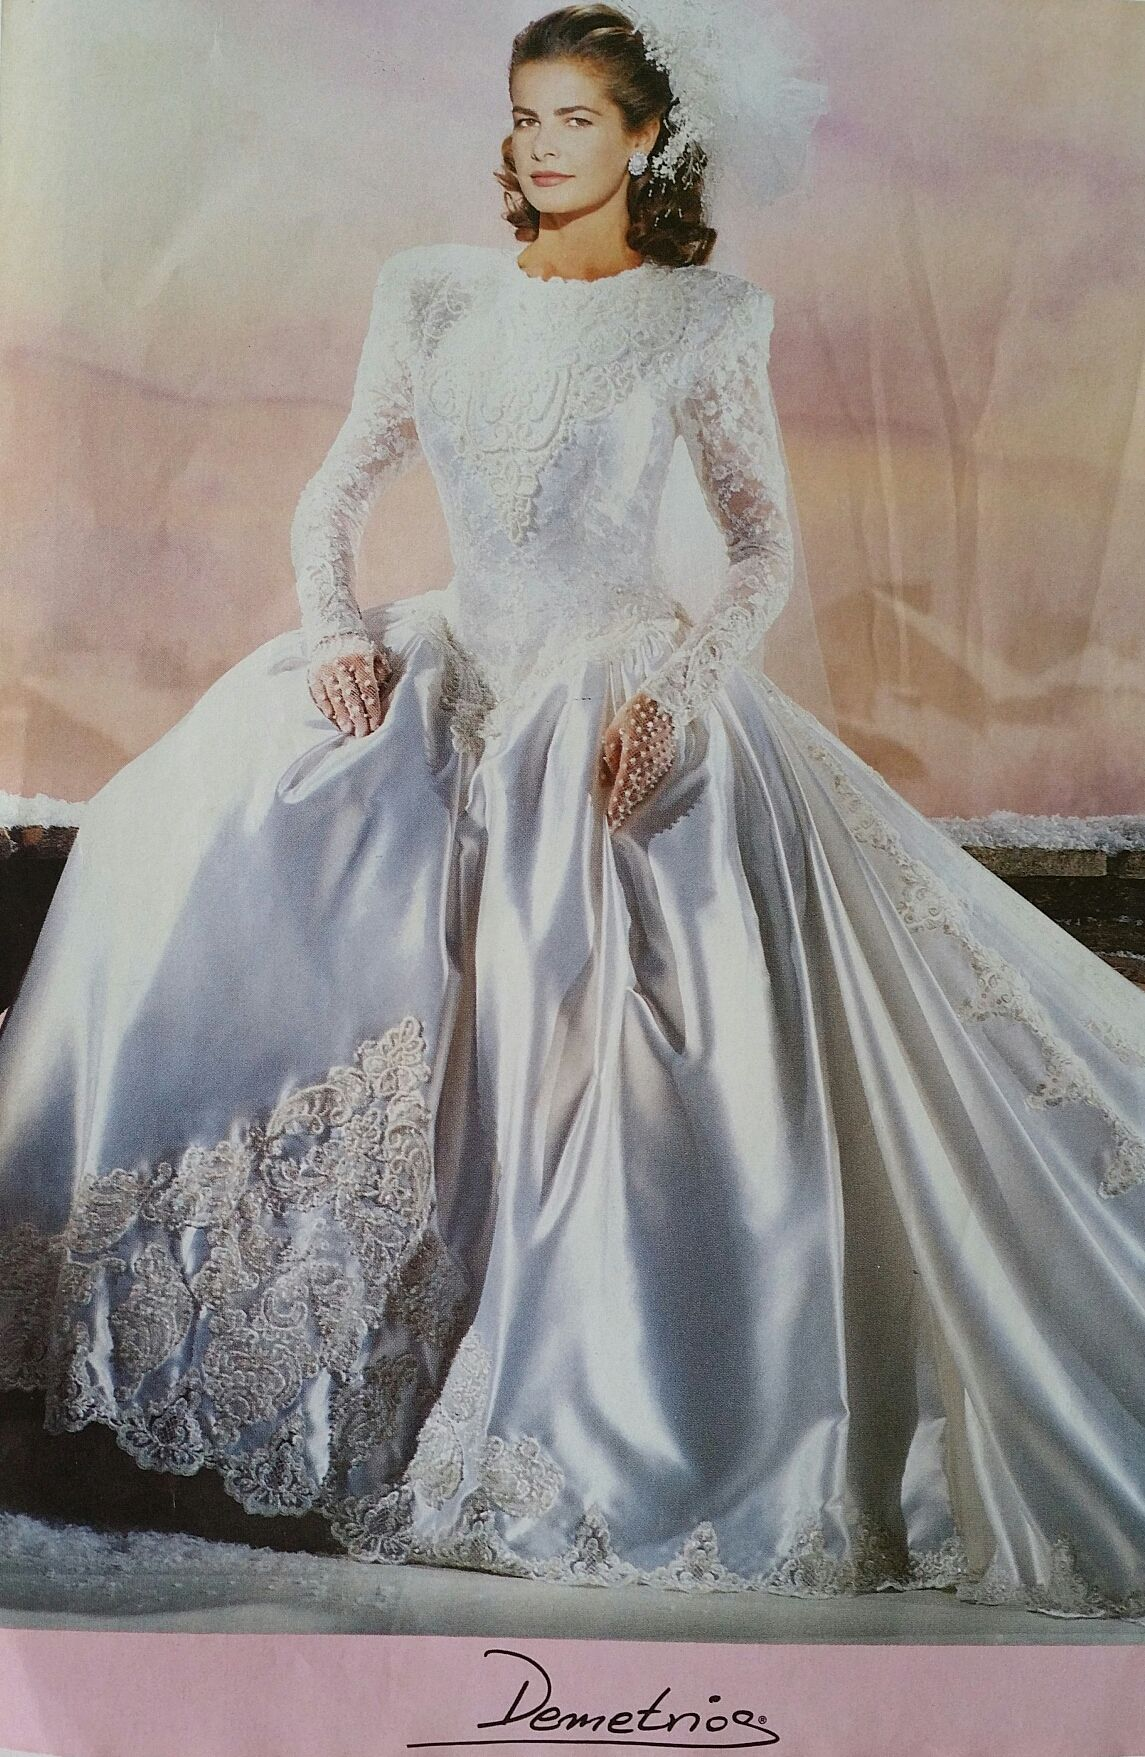 Demetrios Wedding Gowns 001 - Demetrios Wedding Gowns